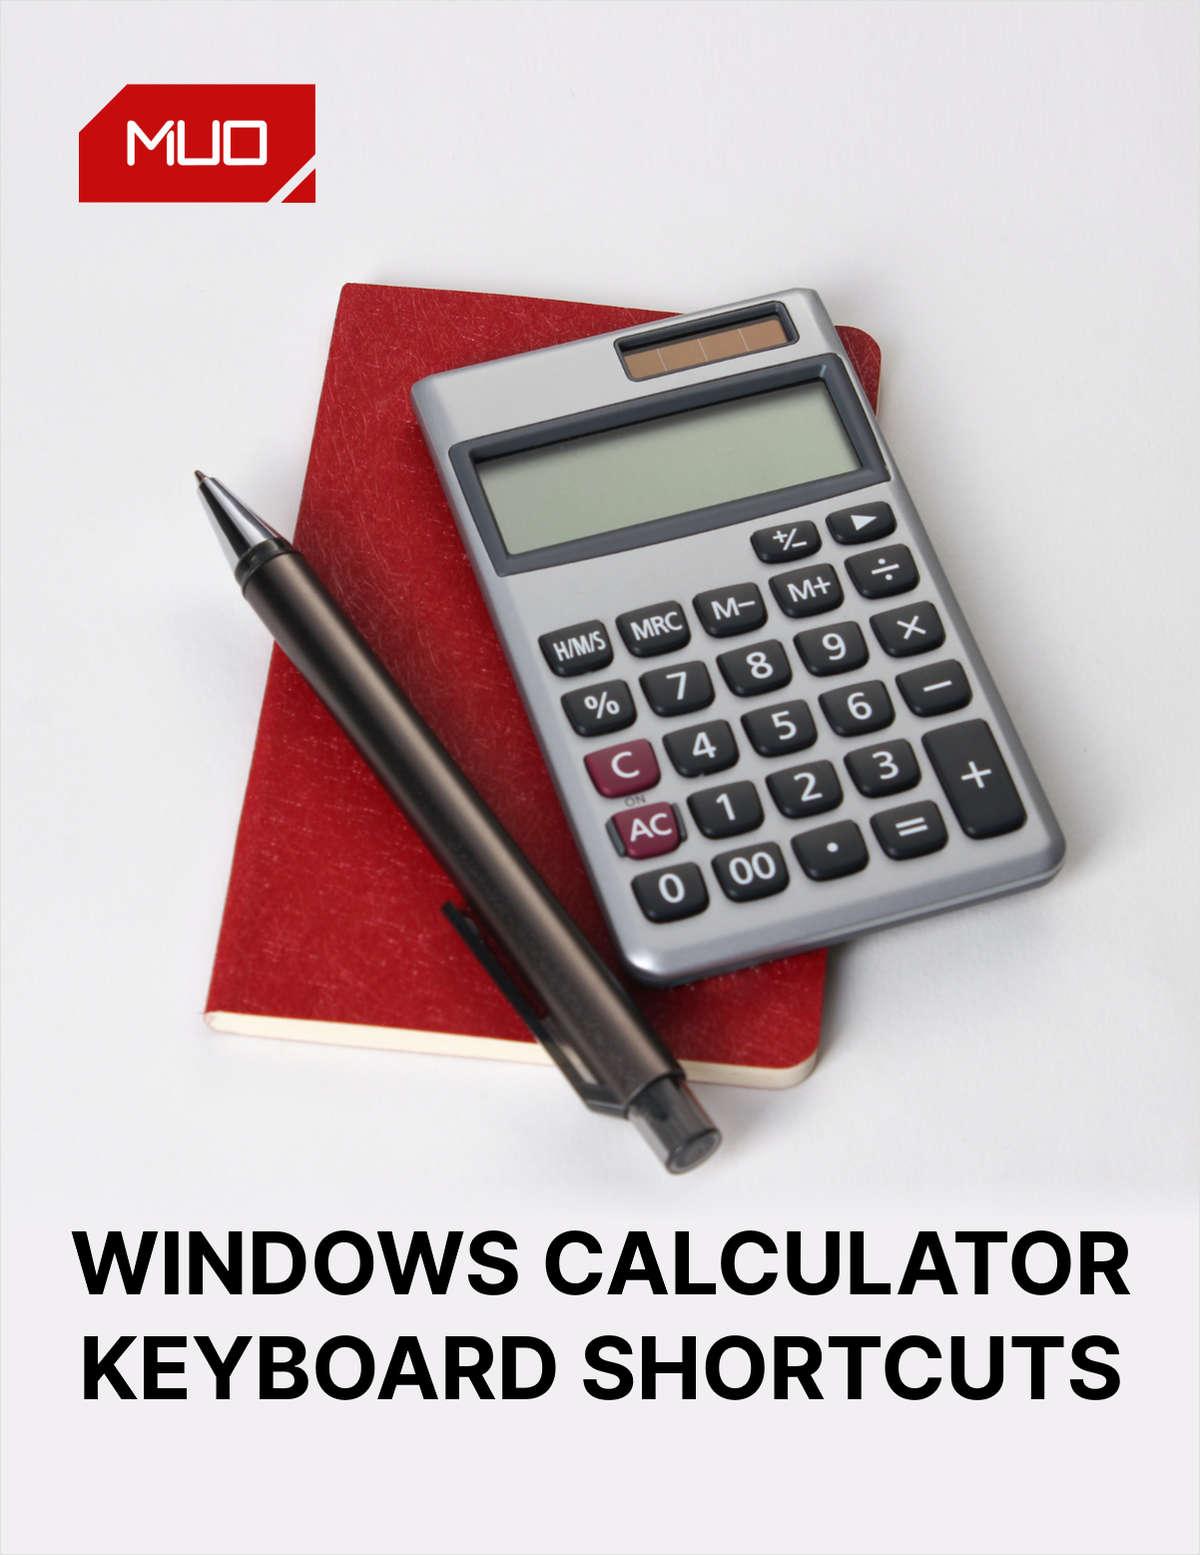 Windows Calculator: The Ultimate Keyboard Shortcuts Cheat Sheet